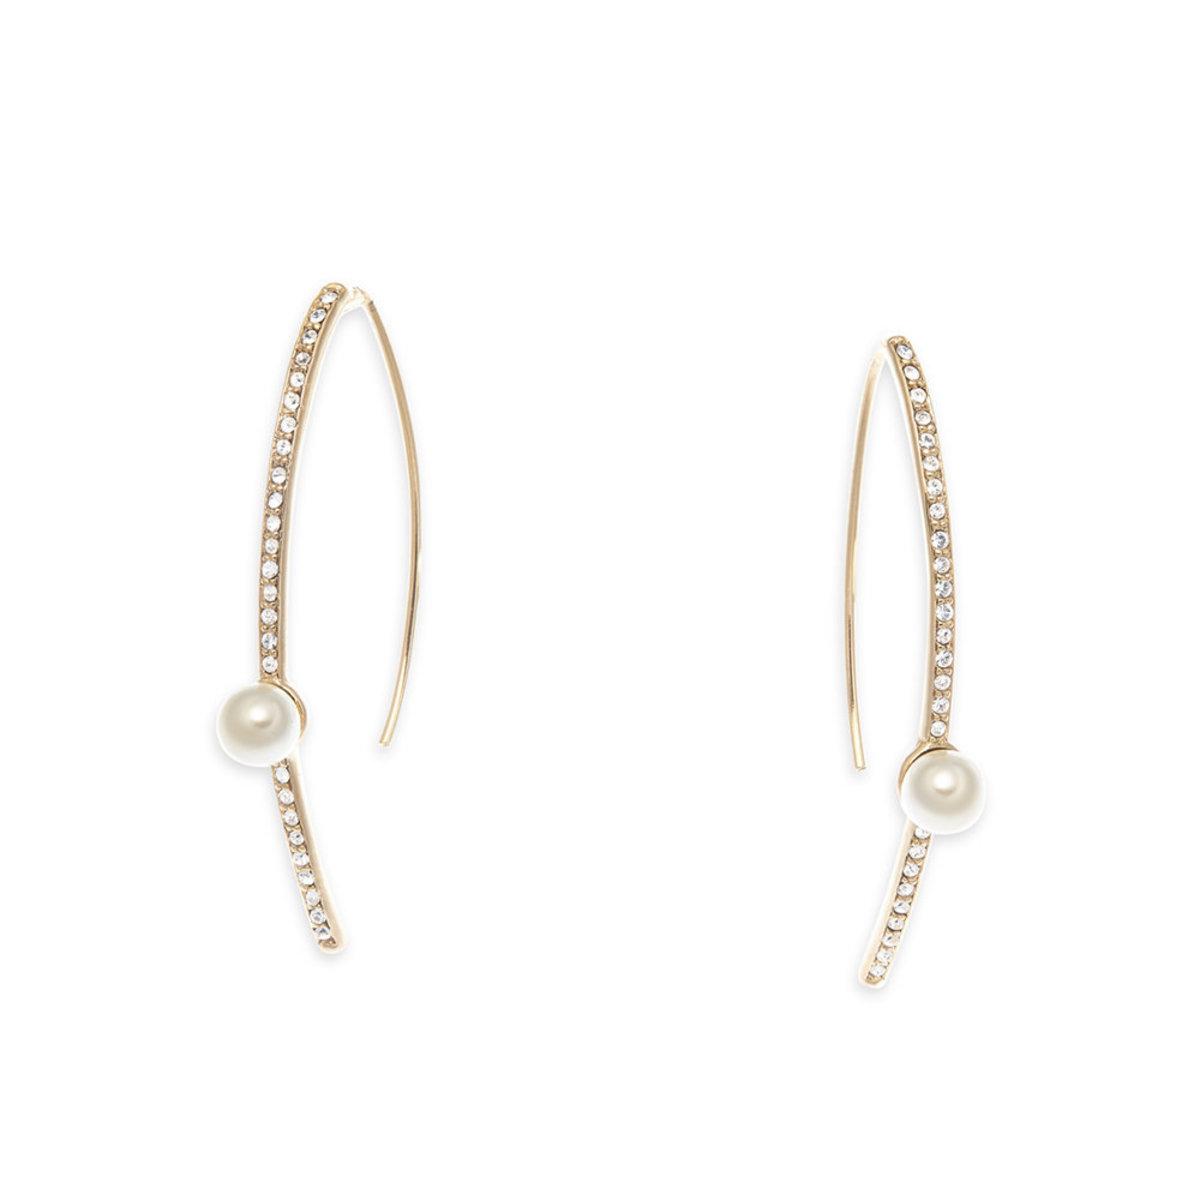 Pearl Light: gold plating, Swarovski crystal, Czech crystal pearl fish hook earrings